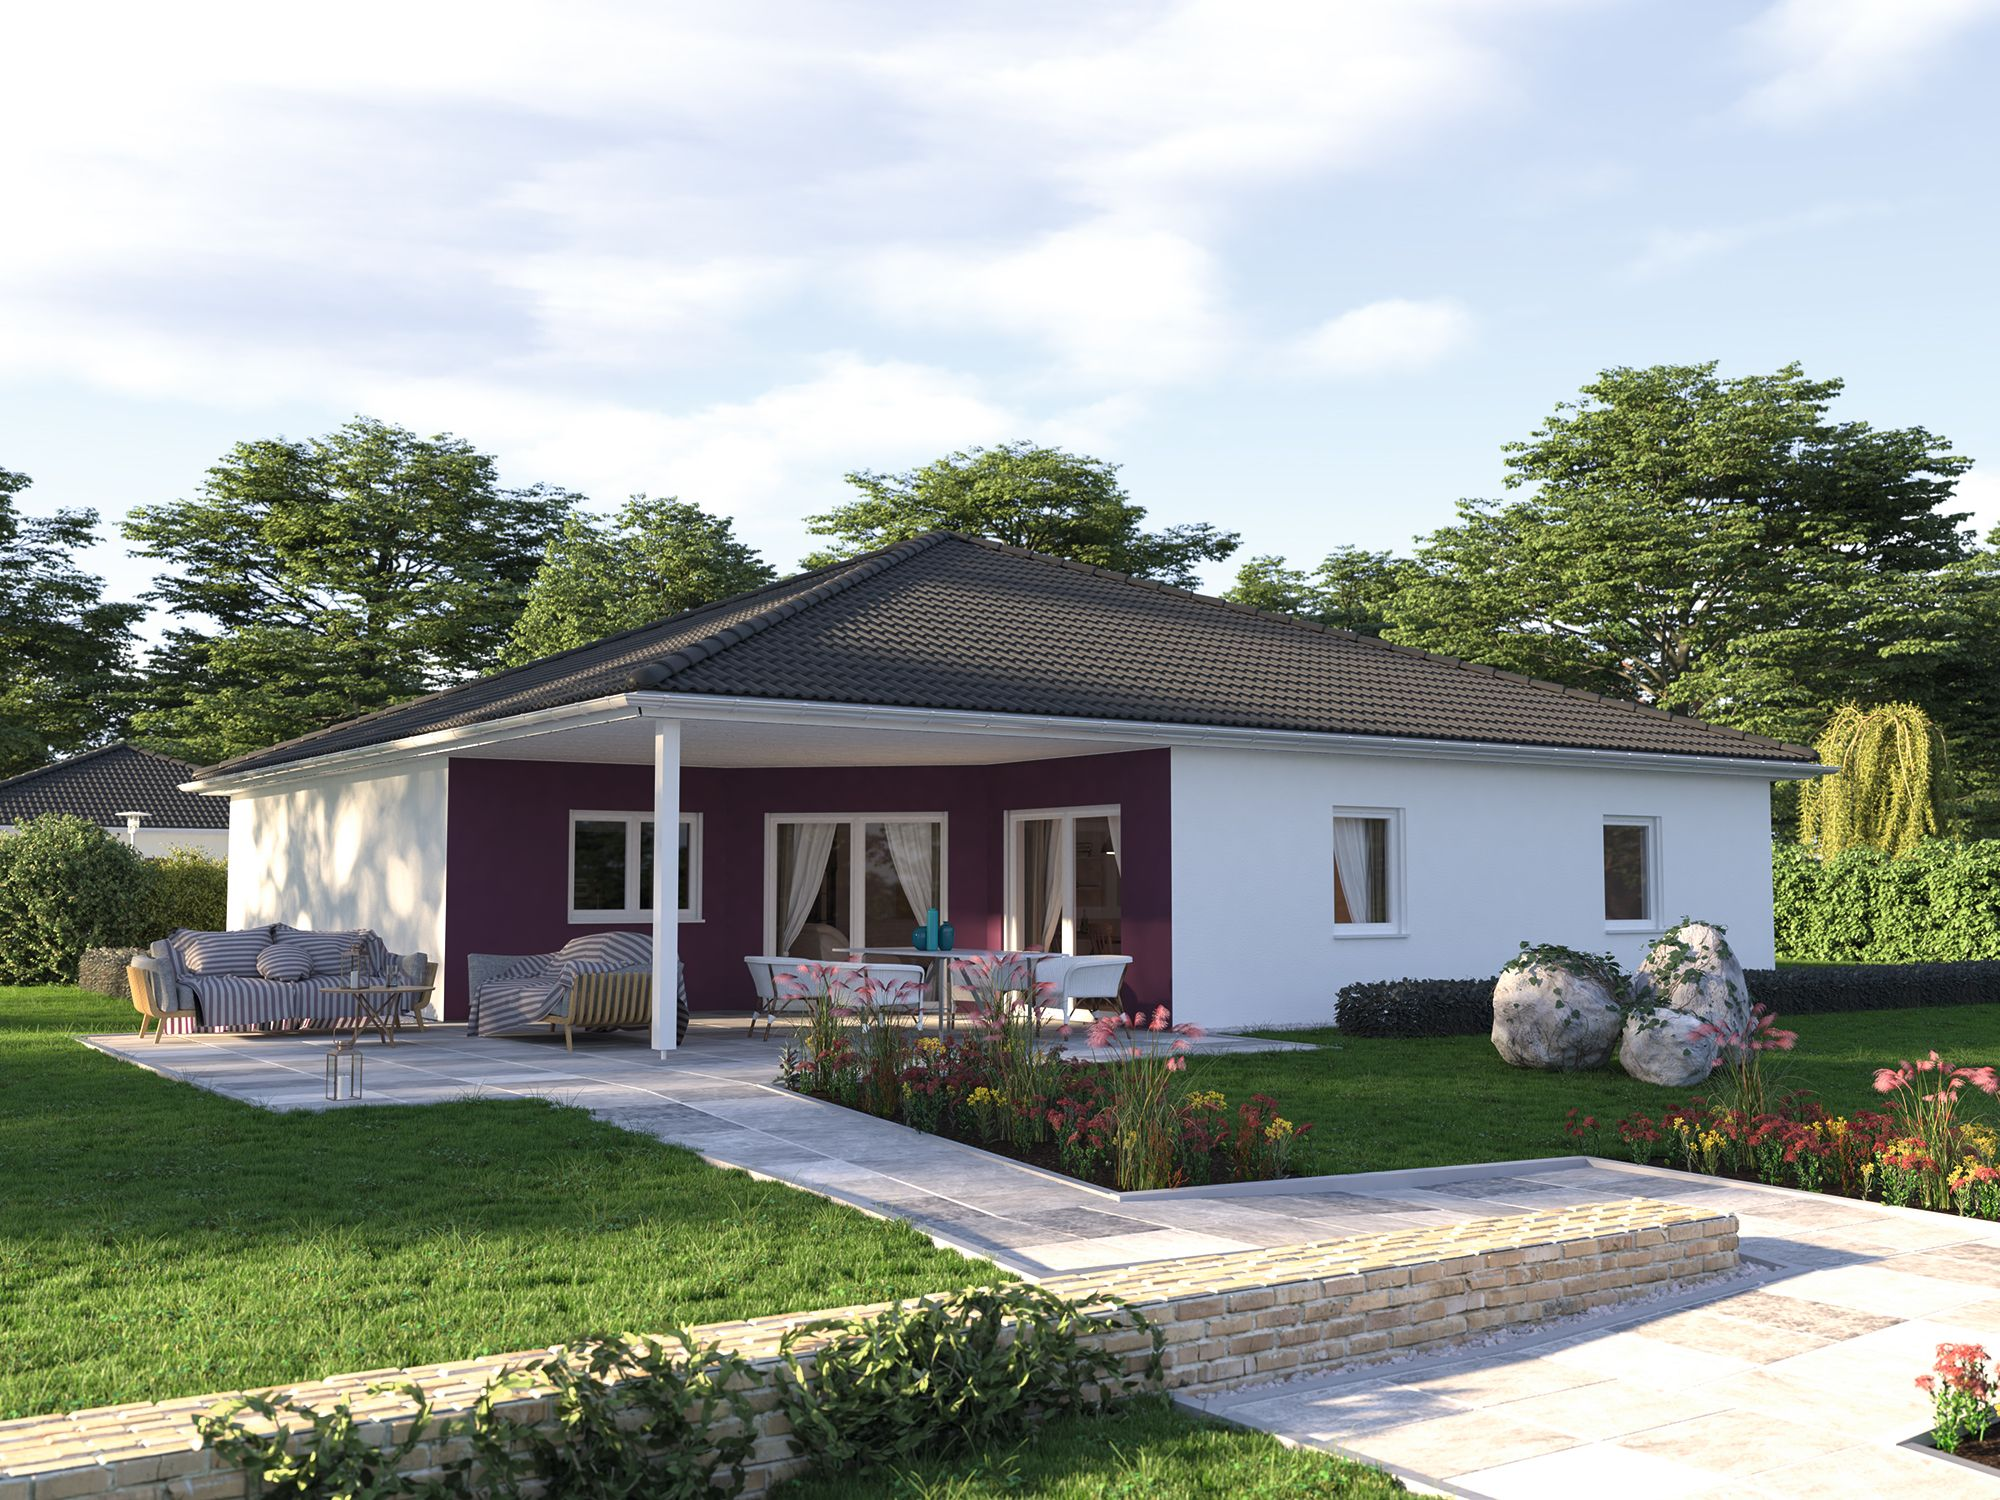 mehr Haus, Bauplan haus und Haus bungalow